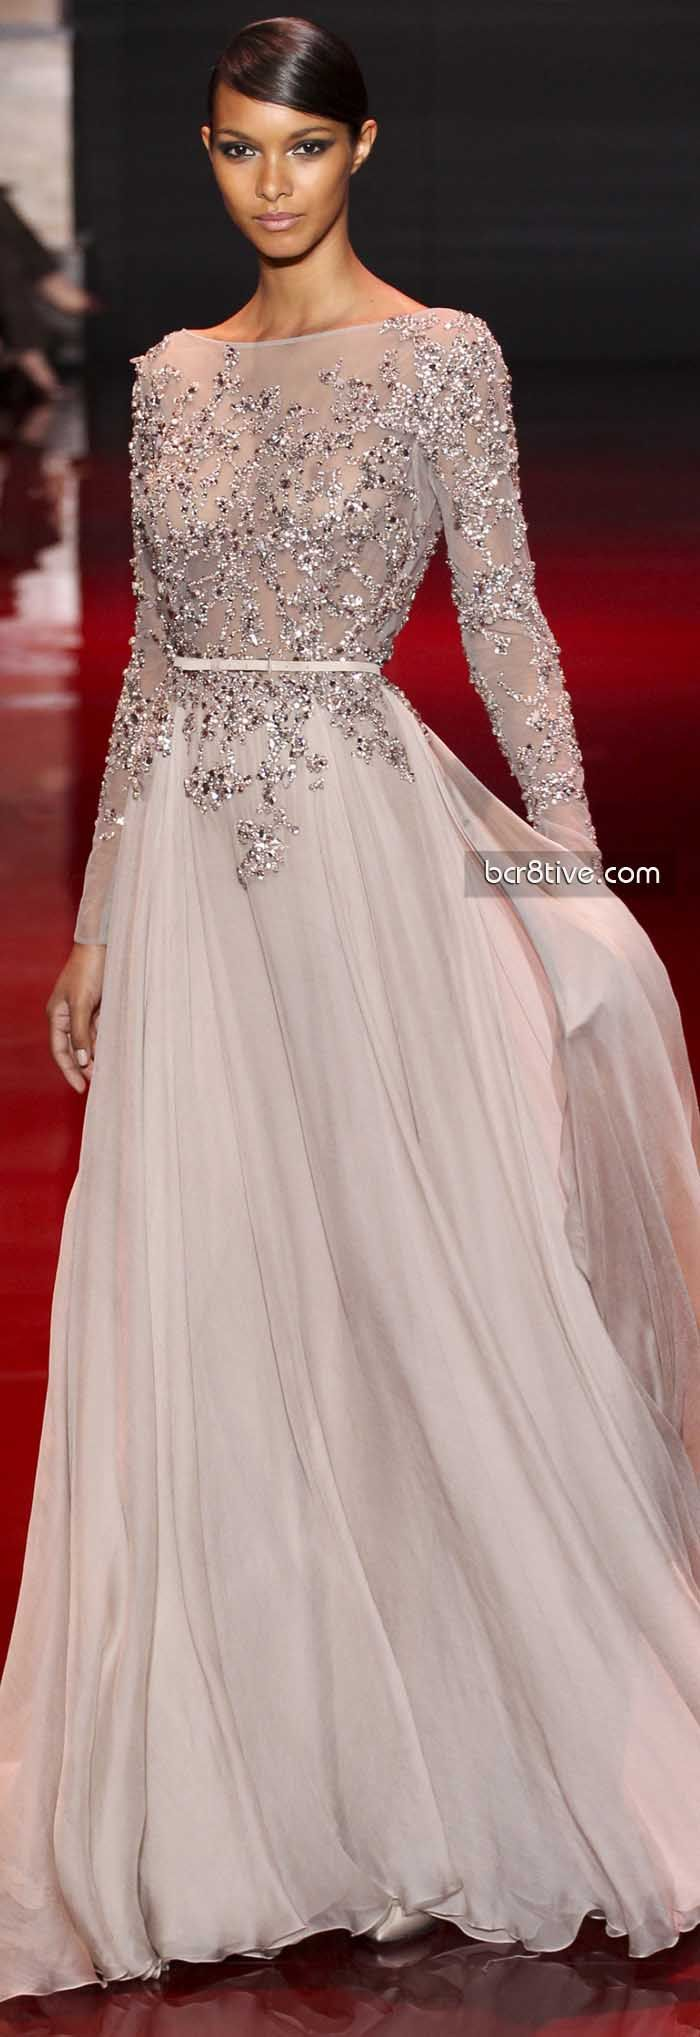 Elie Saab FW 2014 Haute Couture An